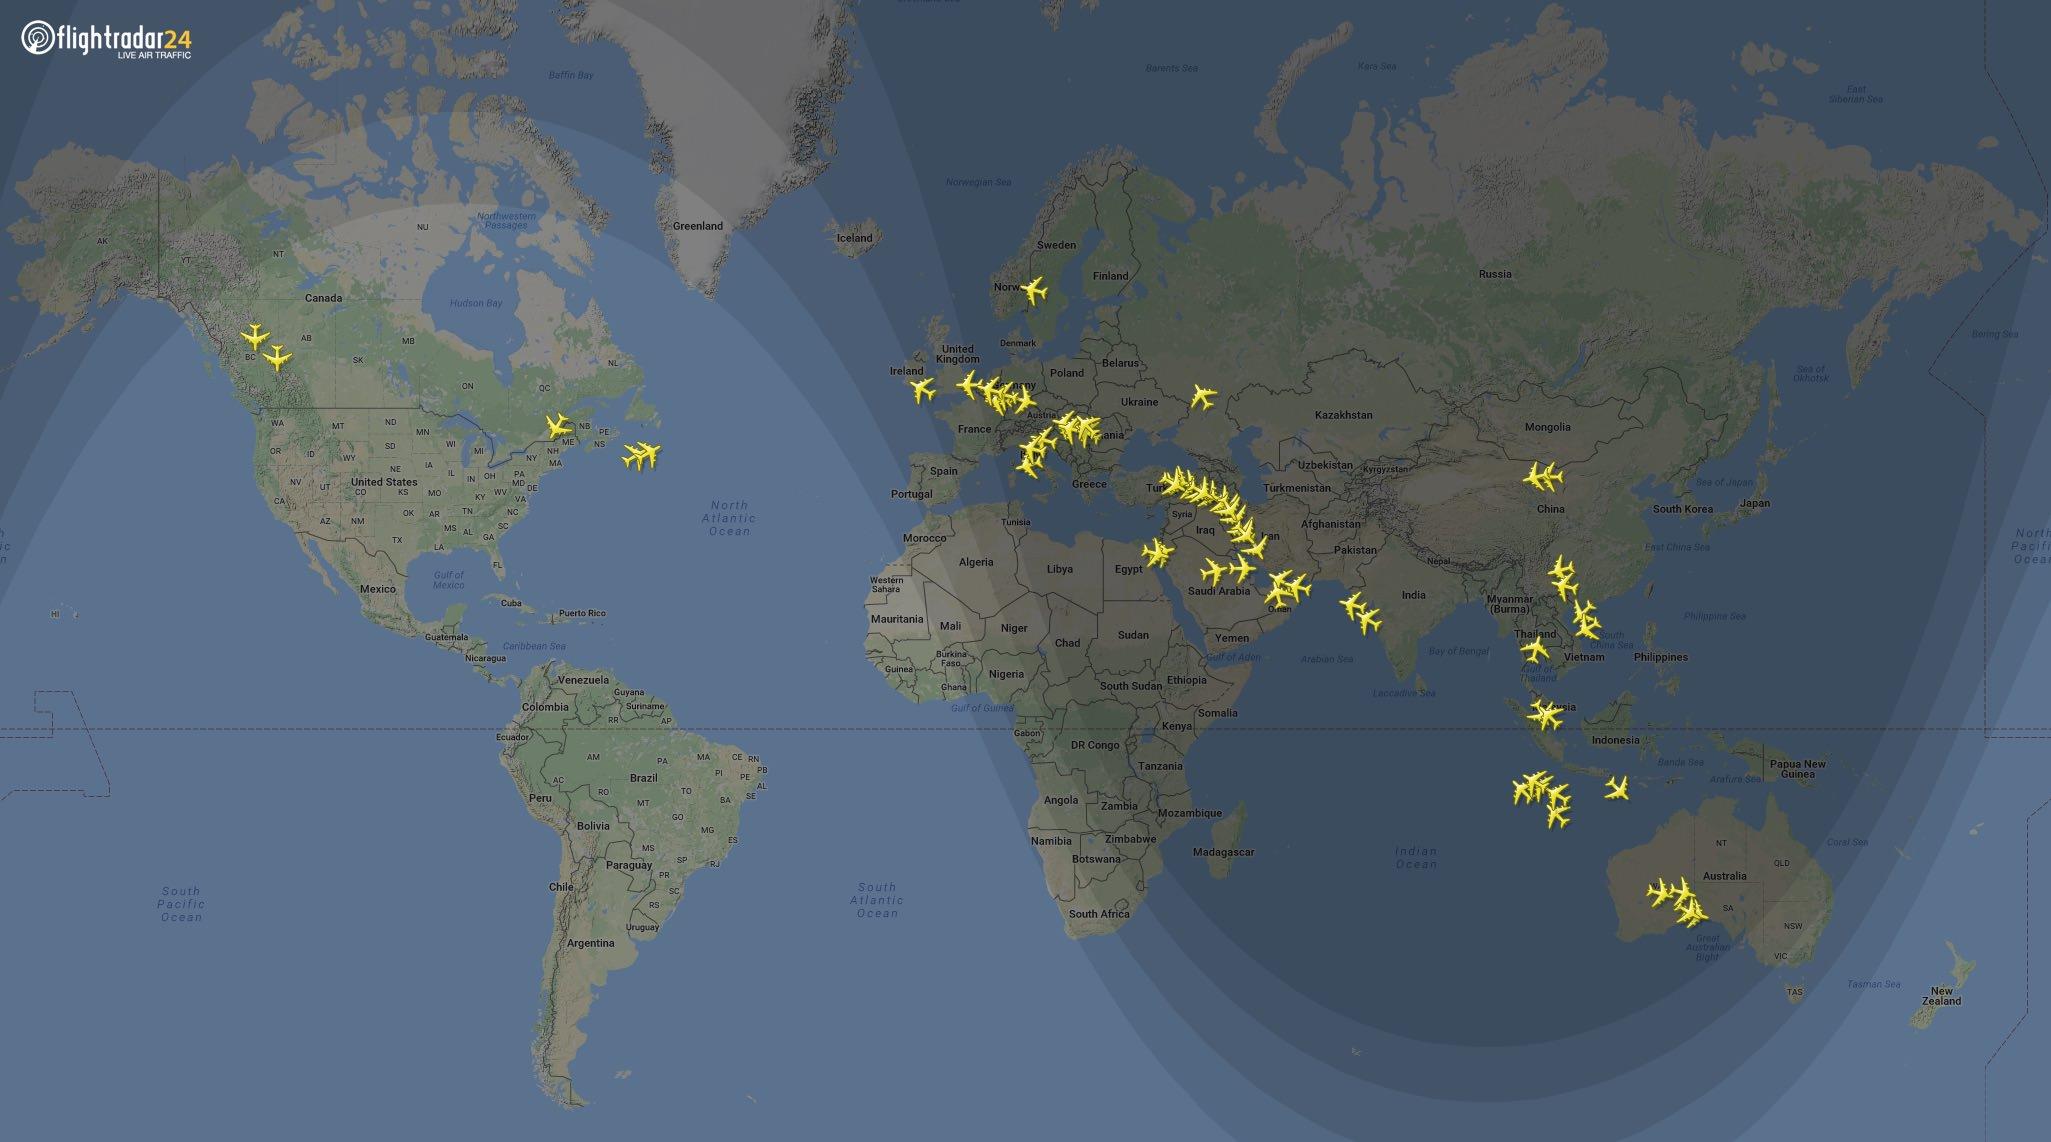 Emirates A380s in flight around the world